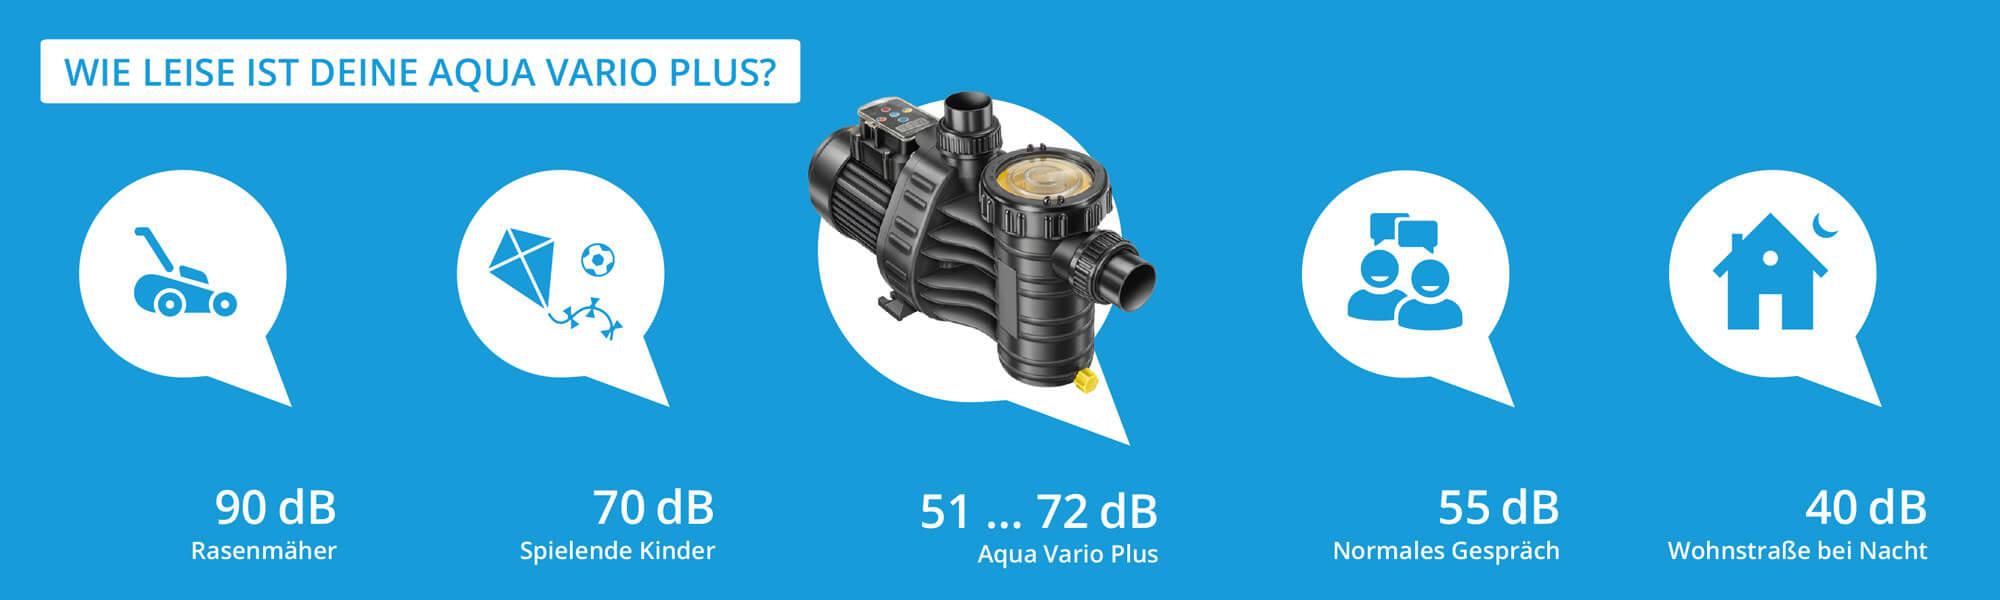 Geräuschevergleich Aqua Vario plus